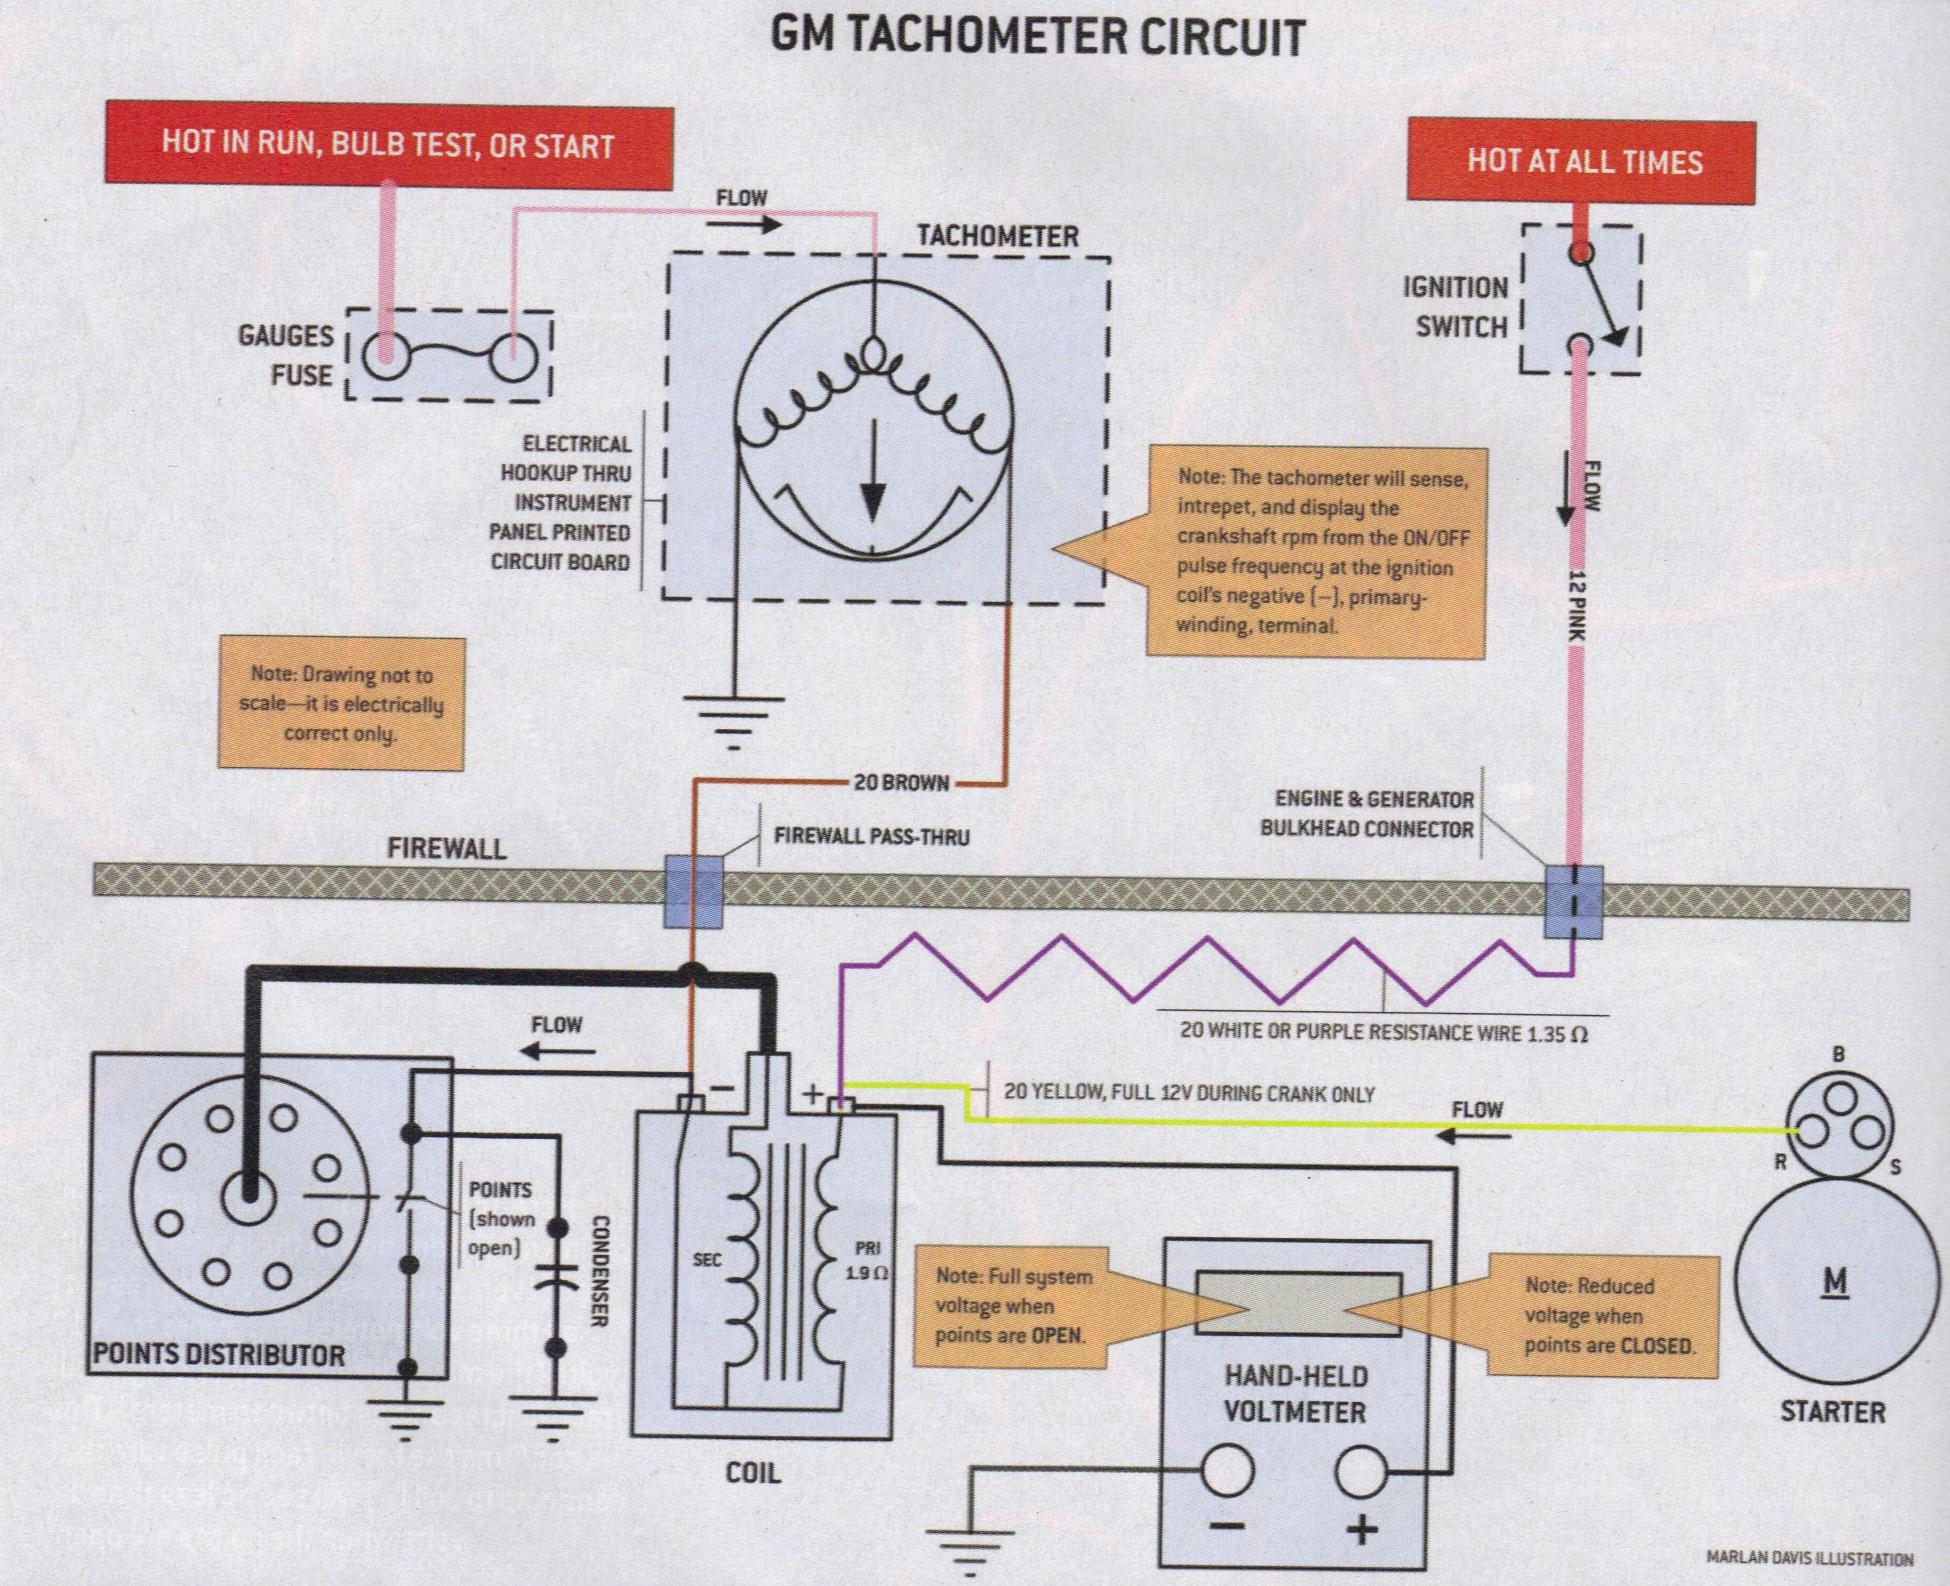 GM_Tach_Wiring?quality\=80\&strip\=all 1972 chevelle wiring diagram tachometer free wiring diagram for you \u2022